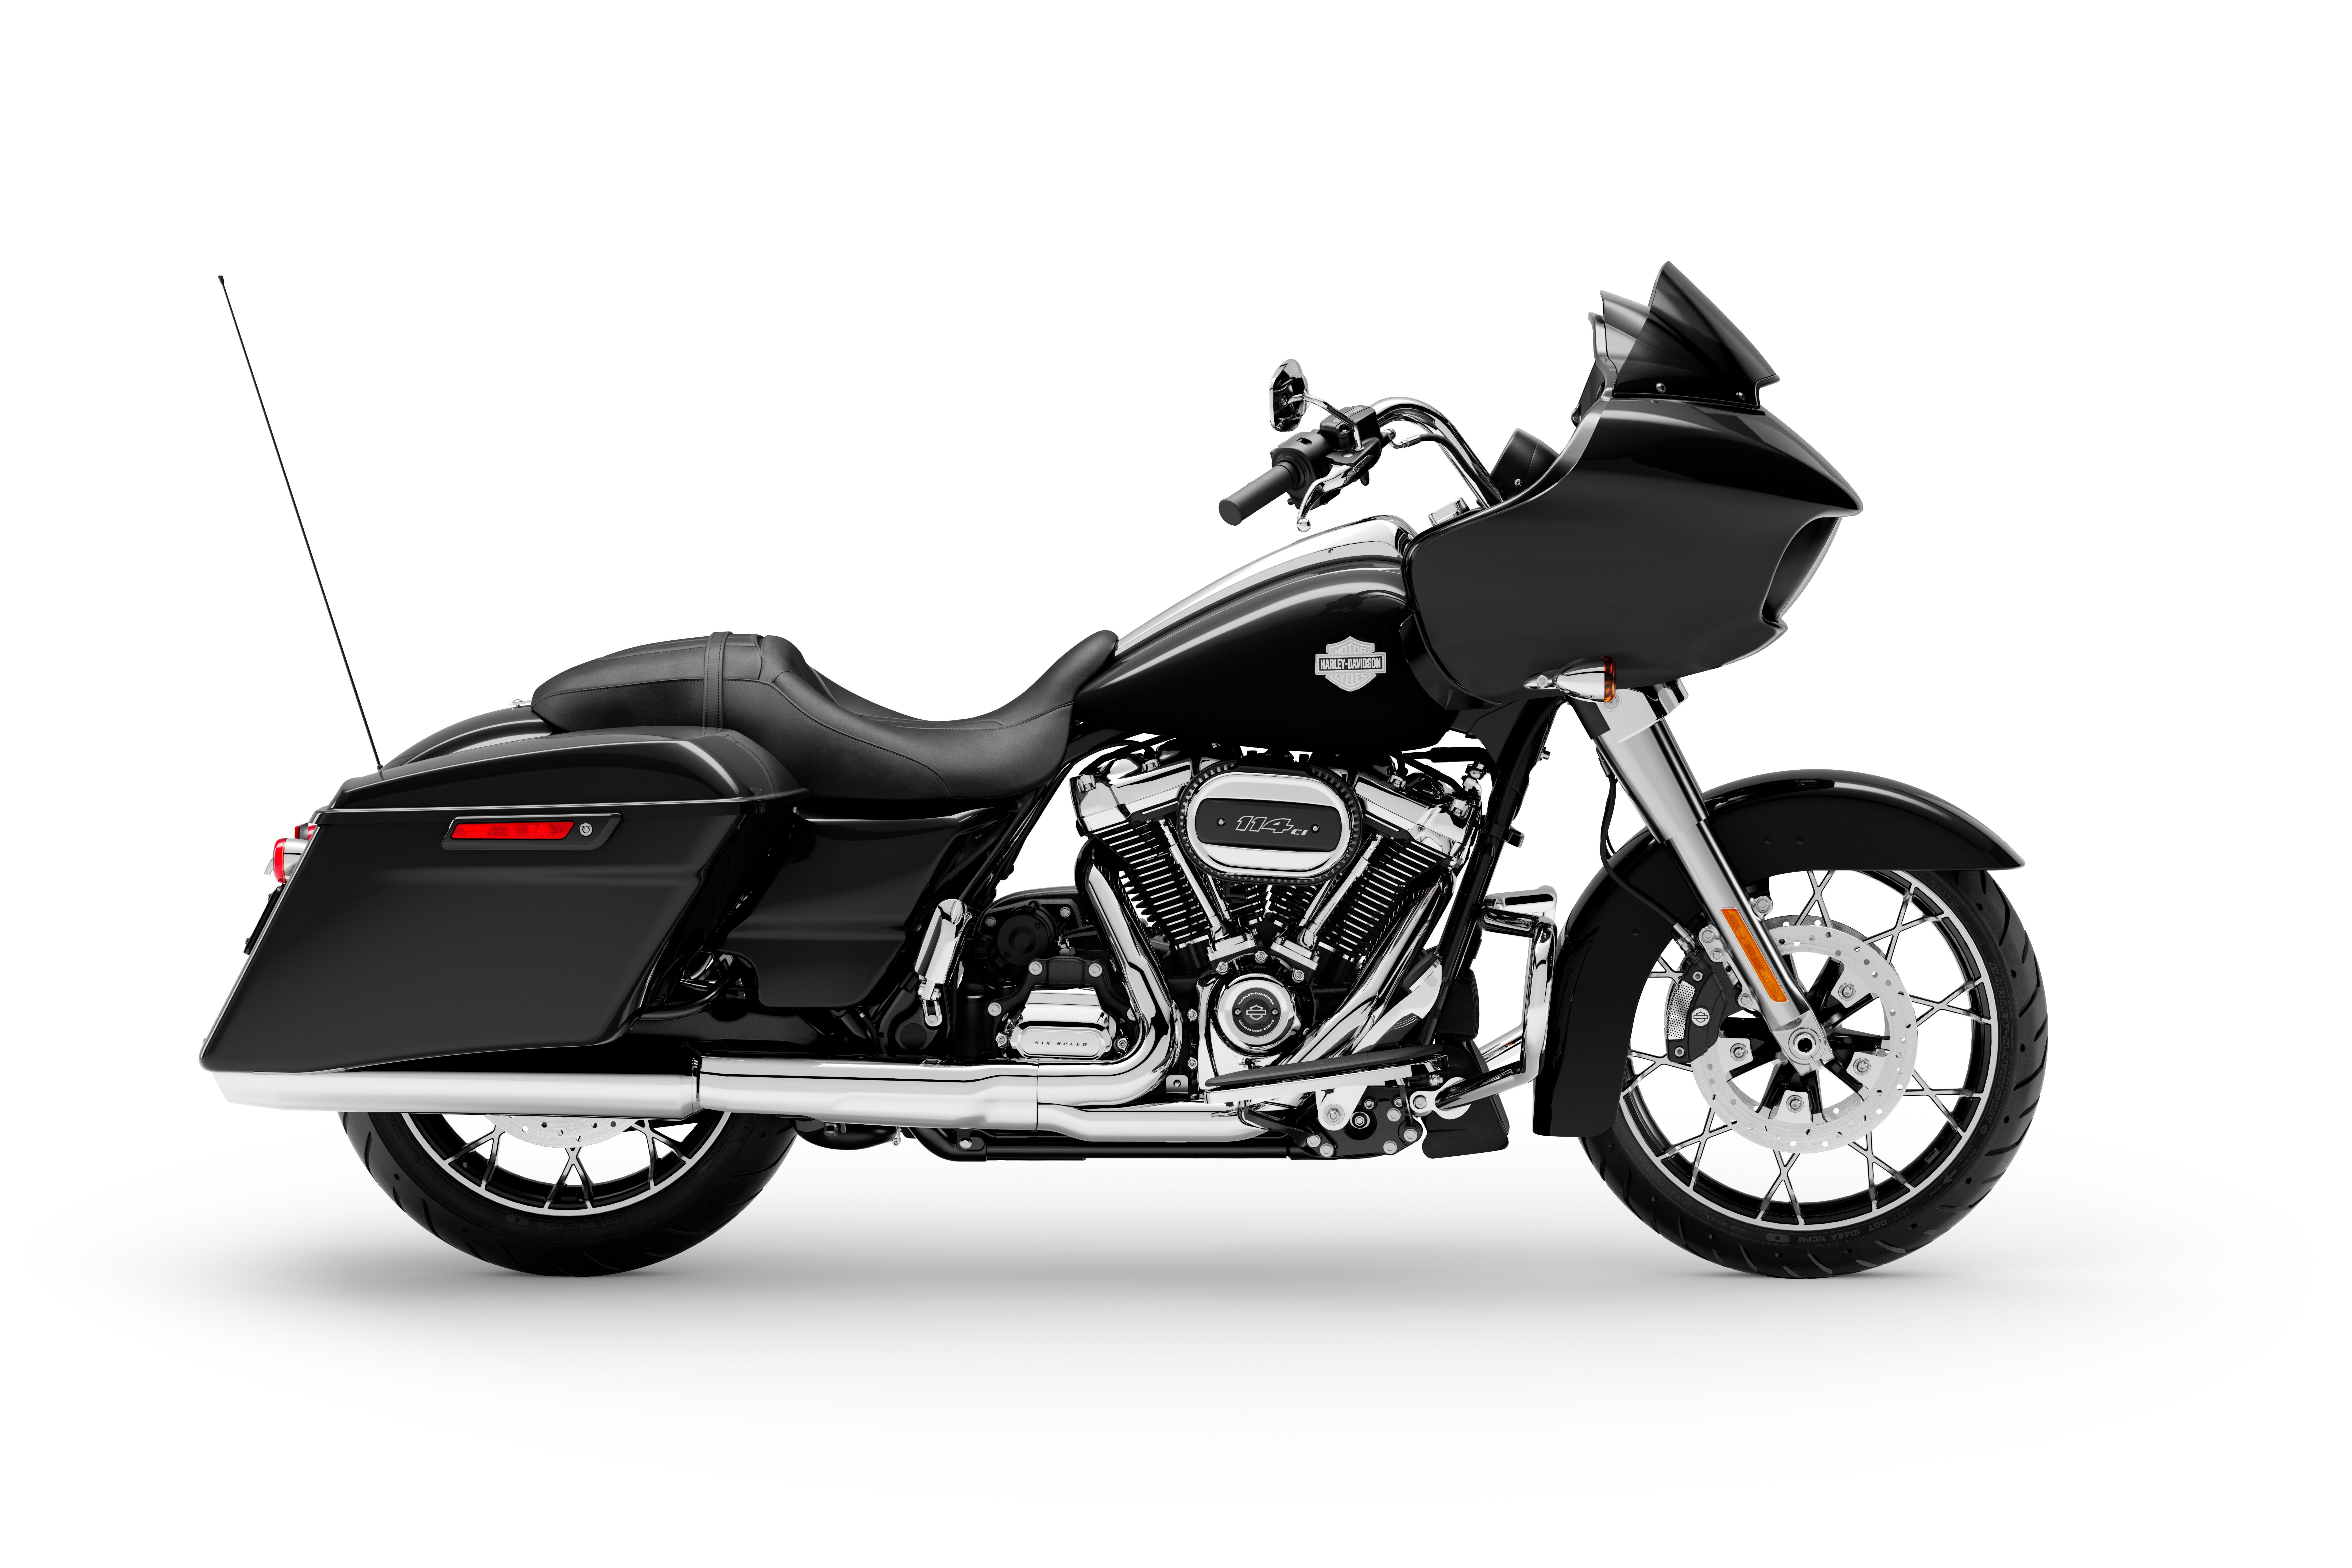 2021 Harley-Davidson Road Glide Special [19]